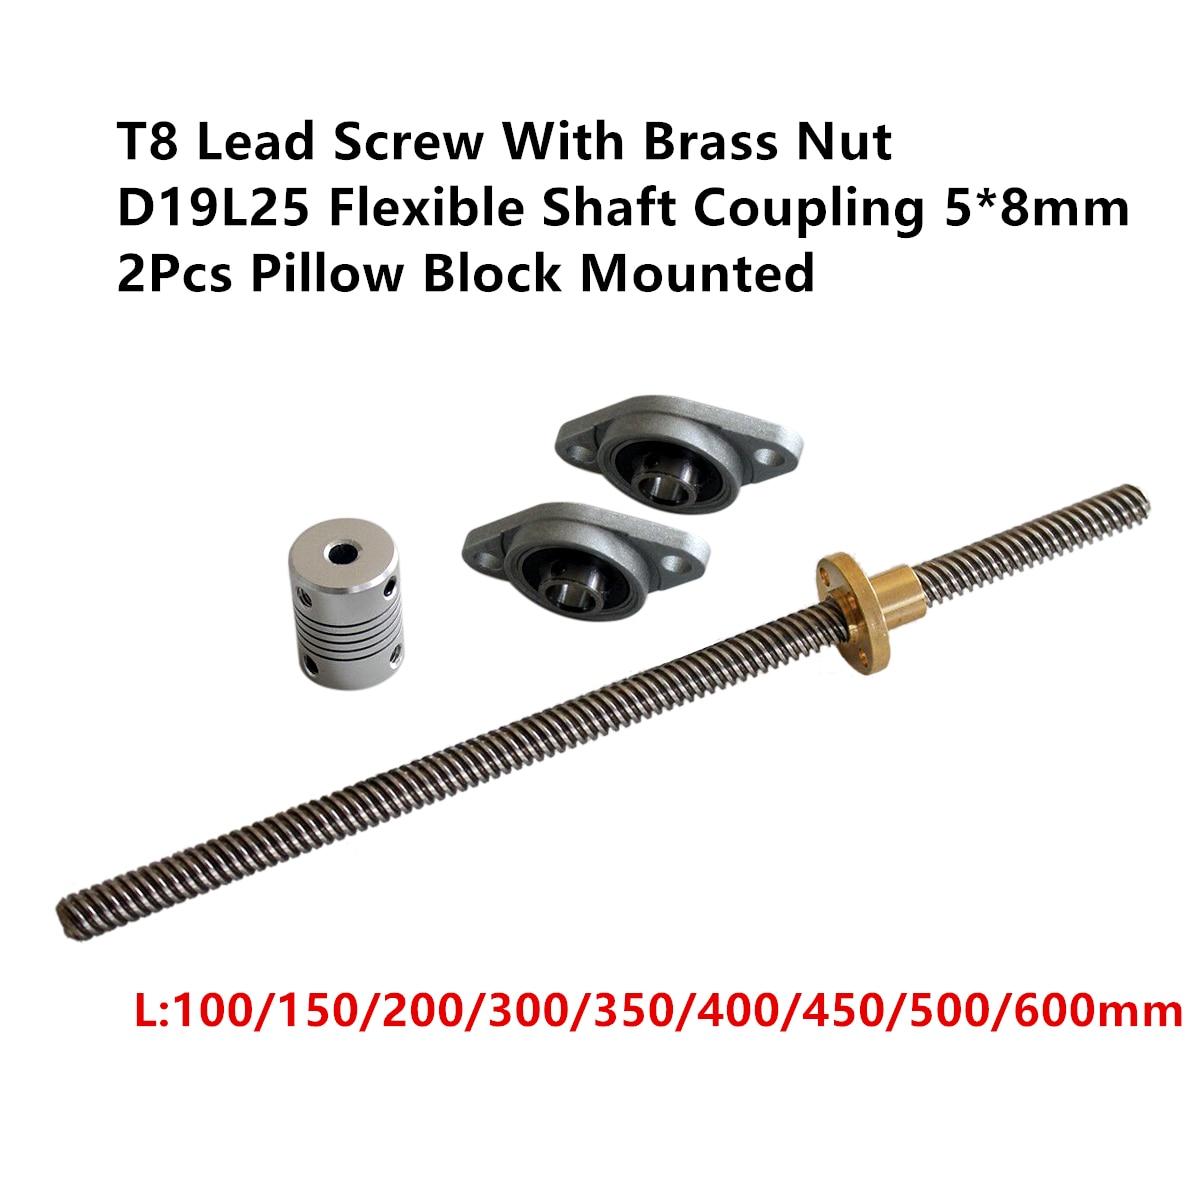 T8 Lead Screw Set 8mm Length 100/300/500/600mm & Brass Nut + D19L25 Flexible Shaft Coupling 5*8mm + 2Pcs Pillow Block MountedT8 Lead Screw Set 8mm Length 100/300/500/600mm & Brass Nut + D19L25 Flexible Shaft Coupling 5*8mm + 2Pcs Pillow Block Mounted